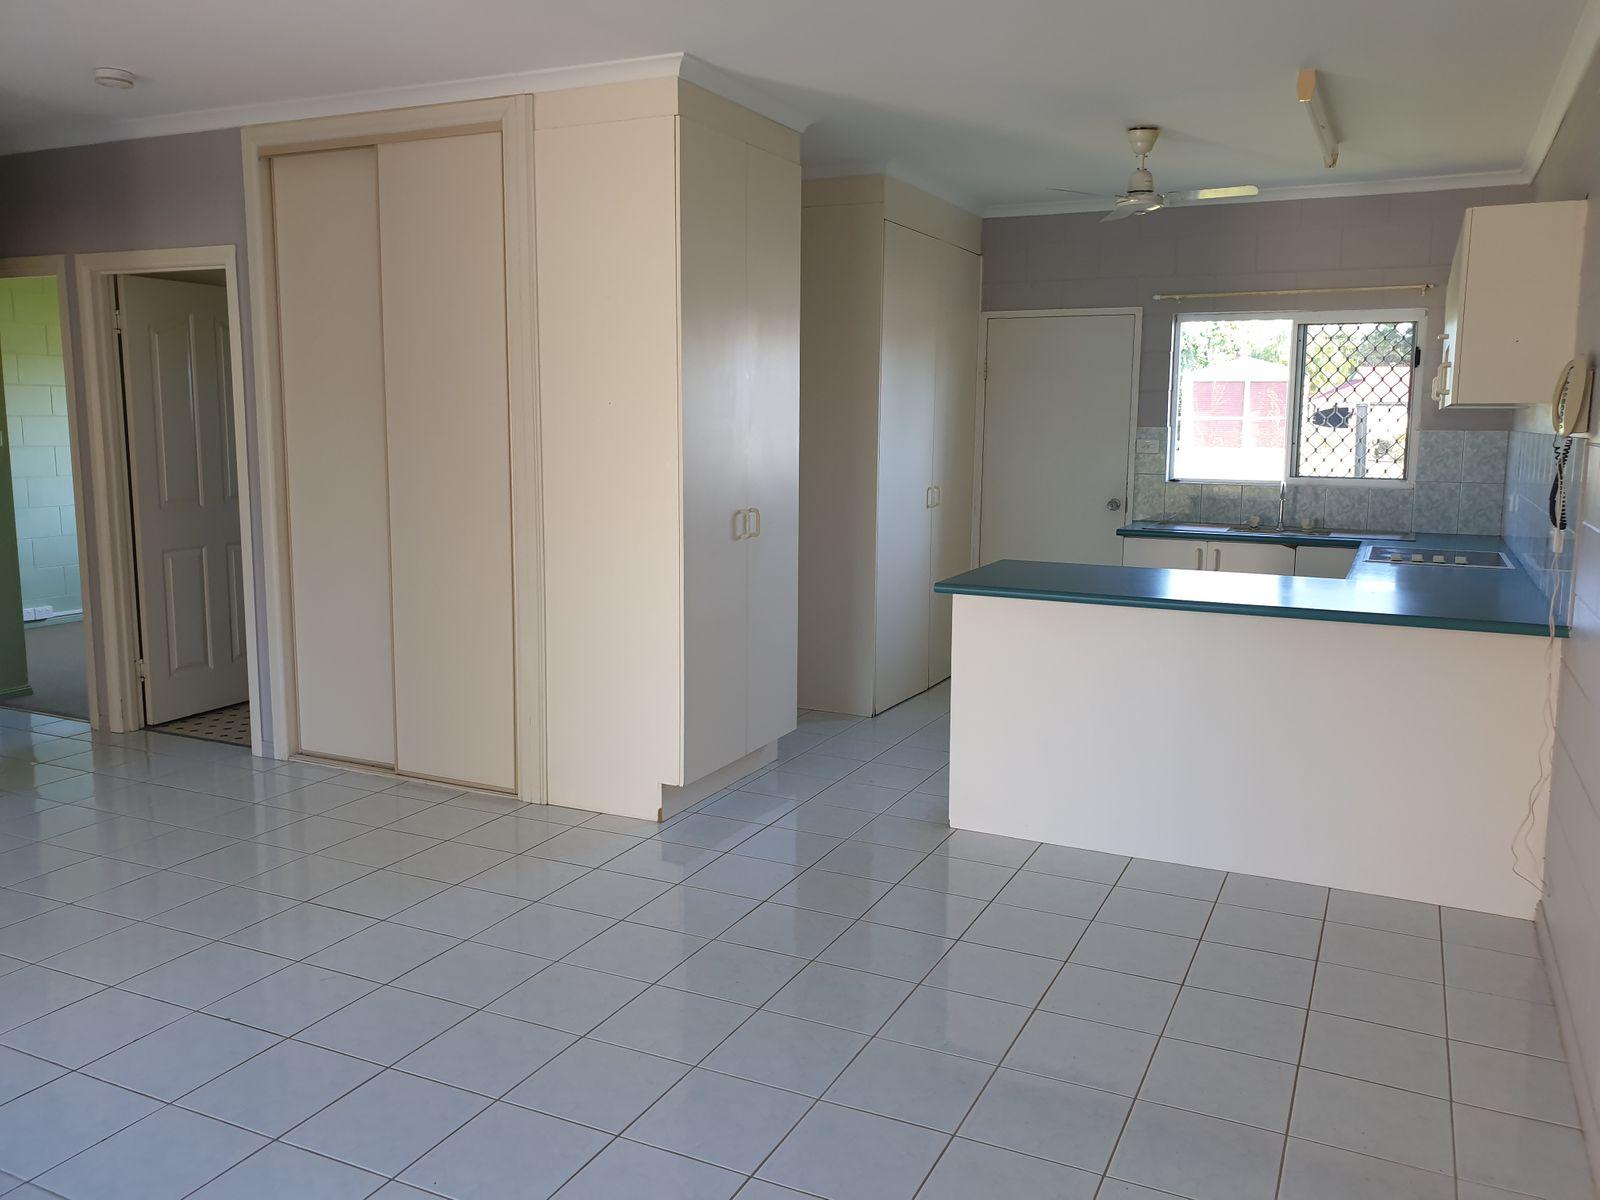 2/6 REYNOLDS Road, Innisfail Estate, QLD 4860